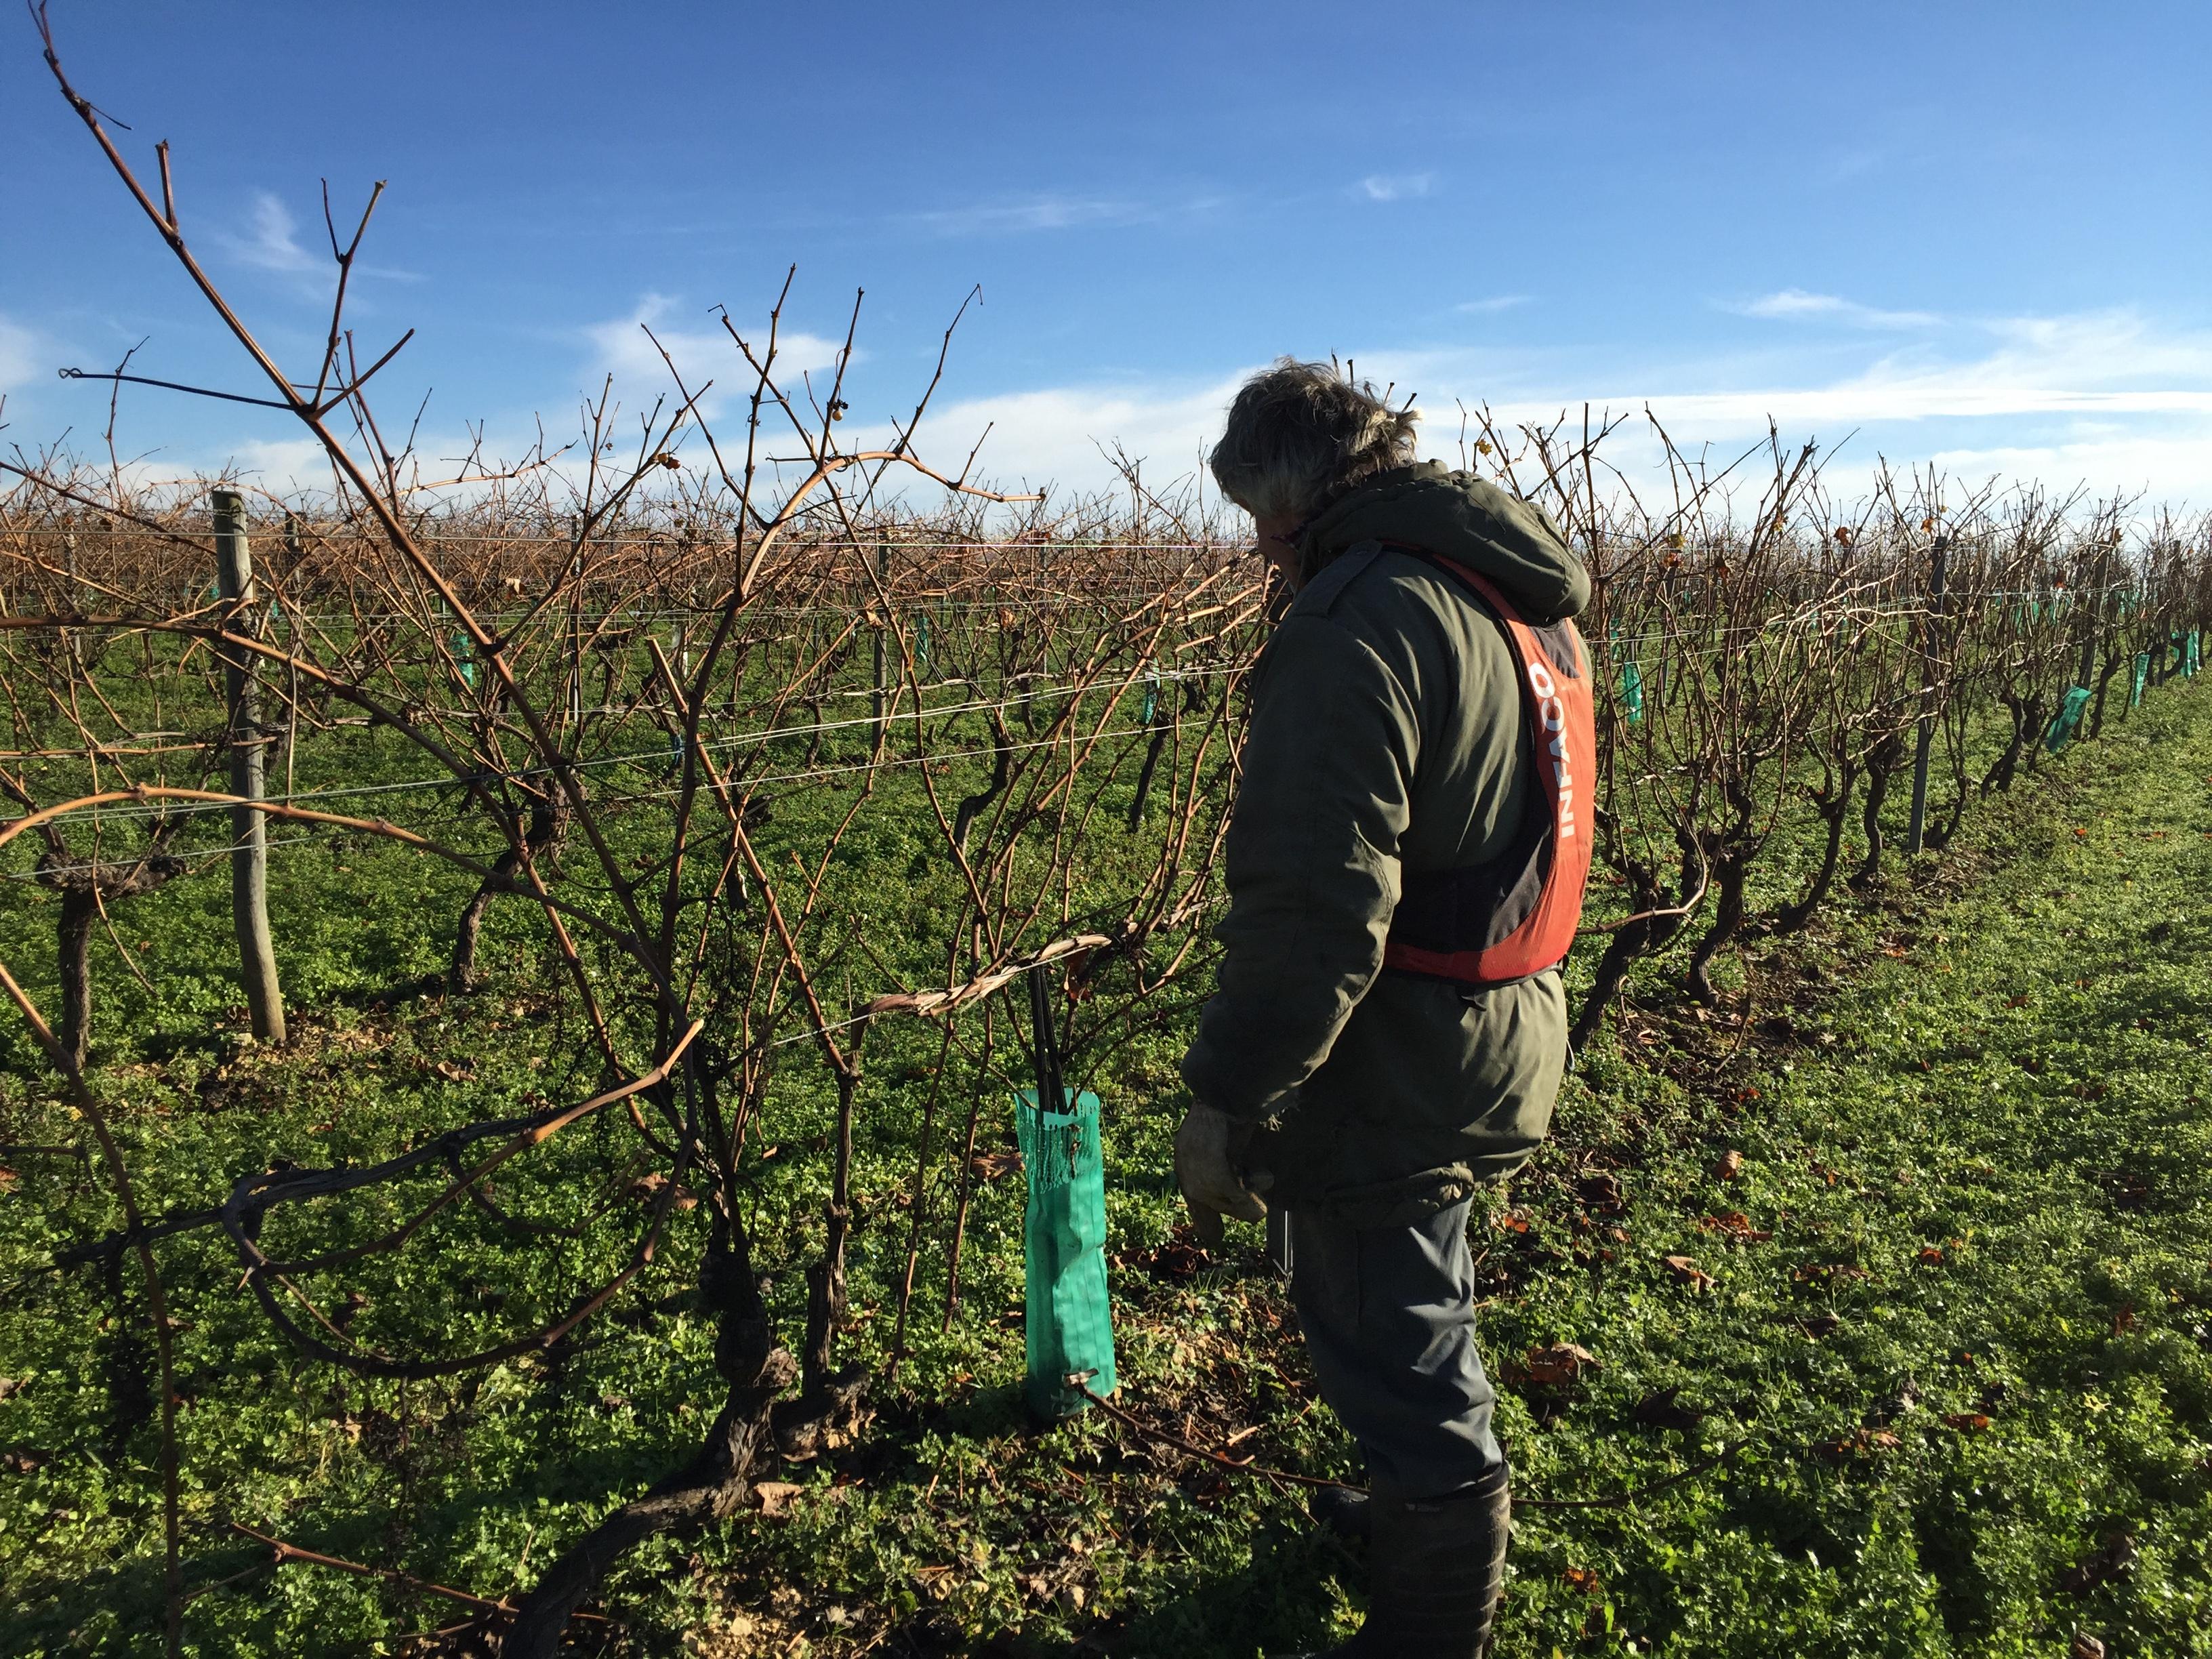 livingincognac - taille vigne